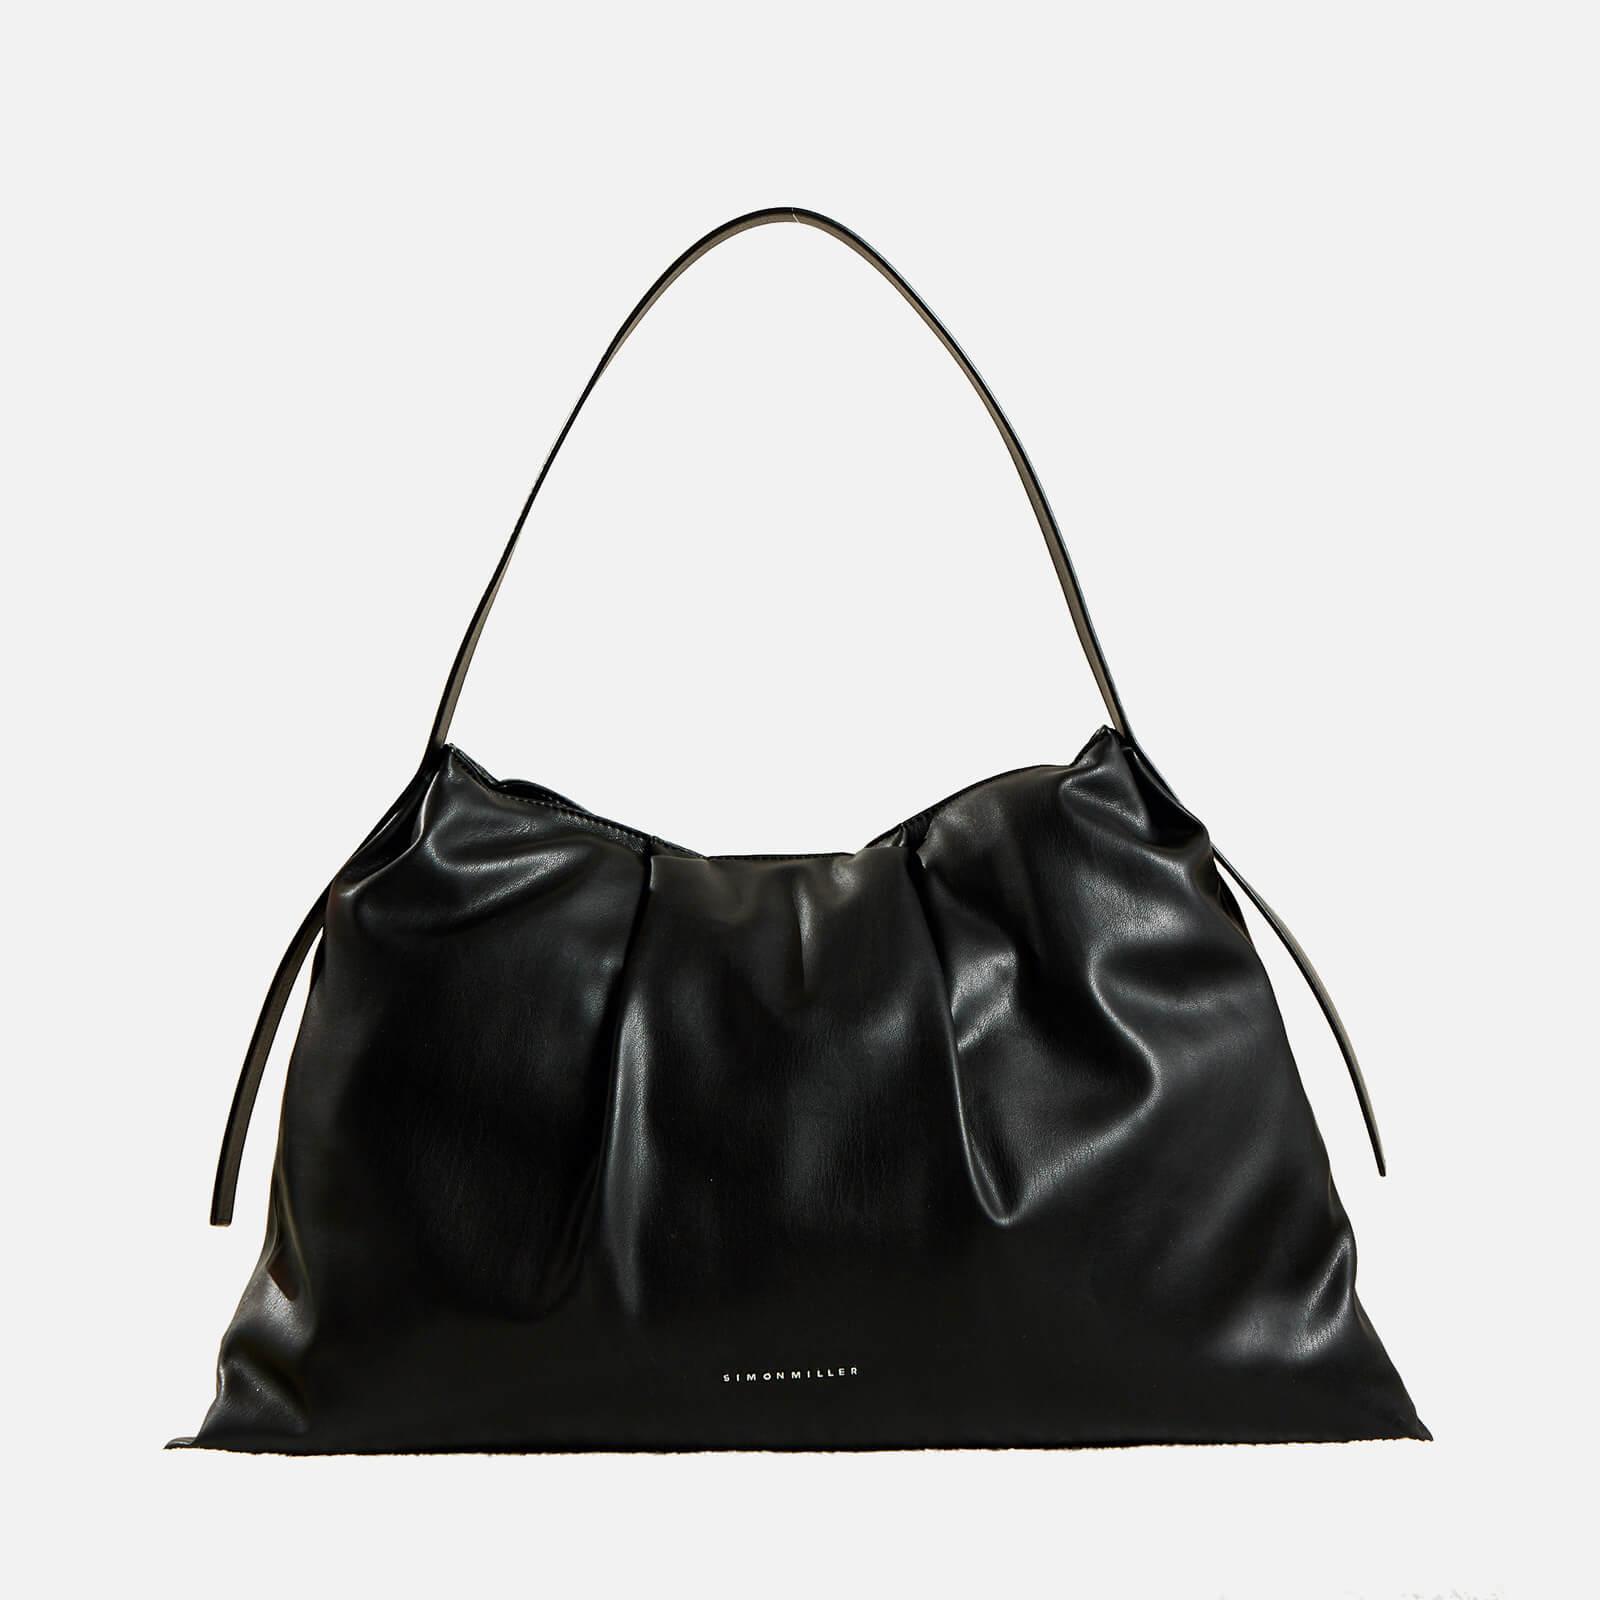 Simon Miller Women's Vegan Puffin Tote Bag - Black